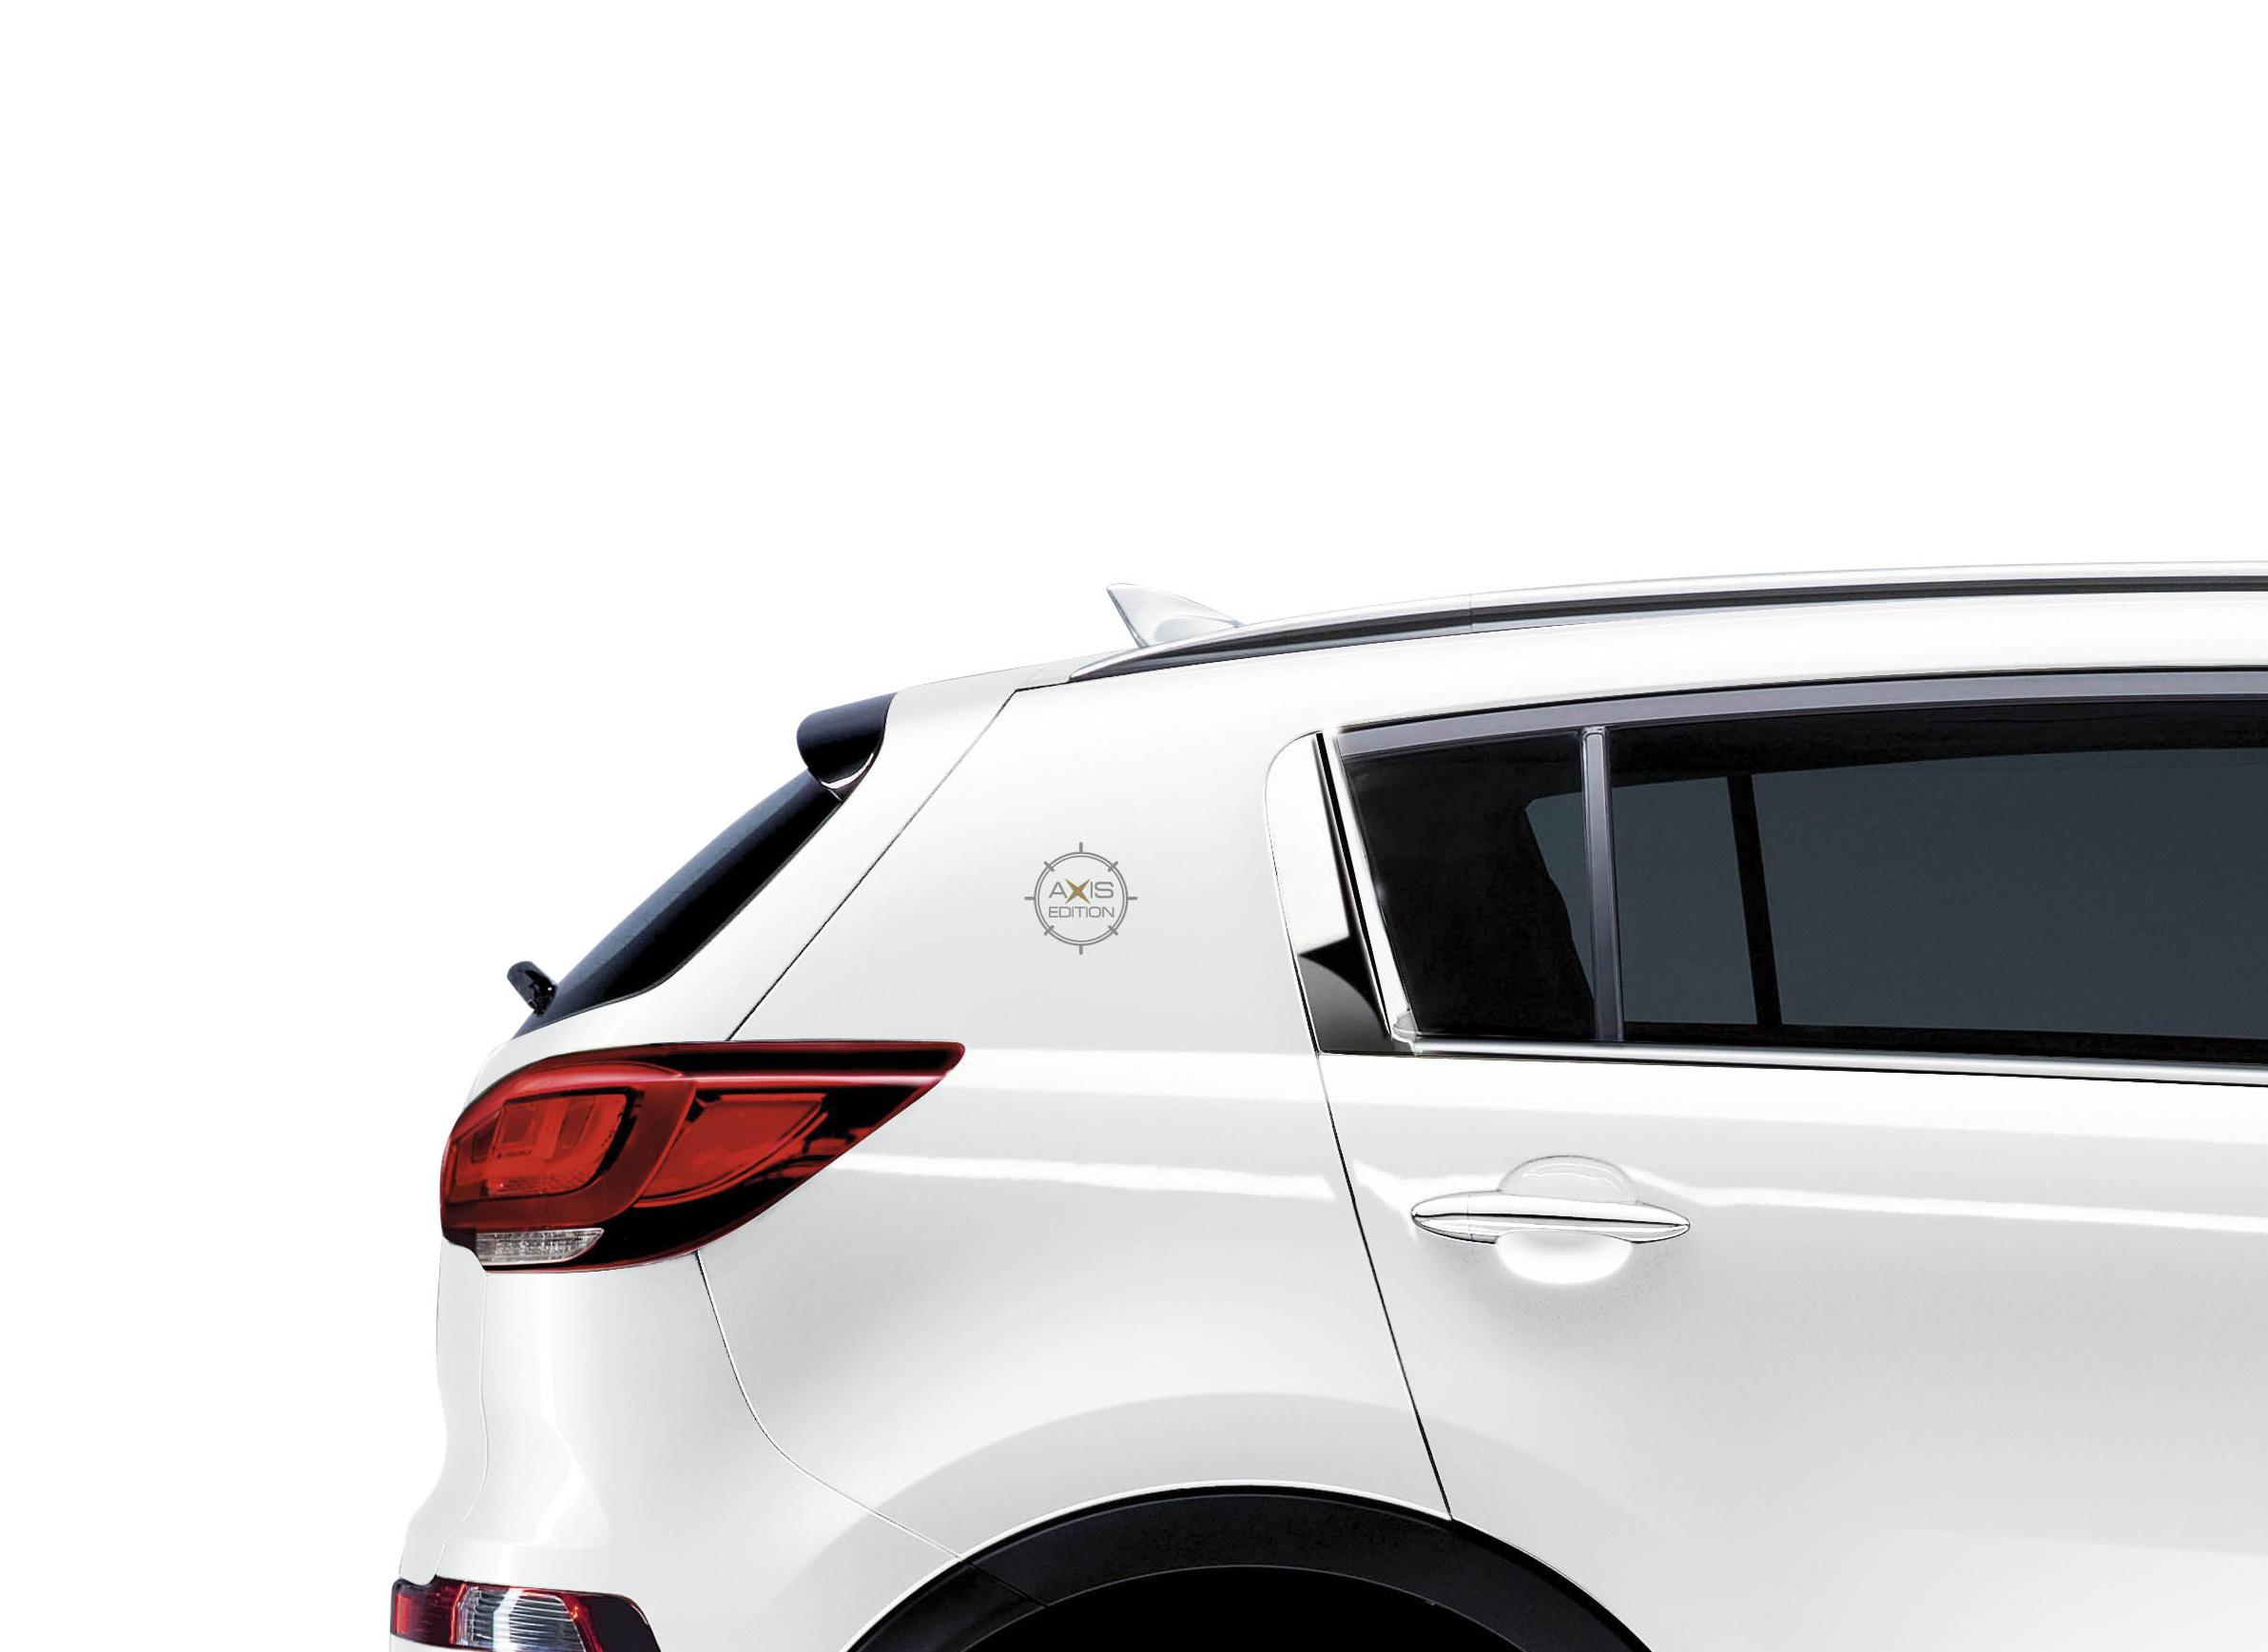 Kia Sportage Axis Limited Edition